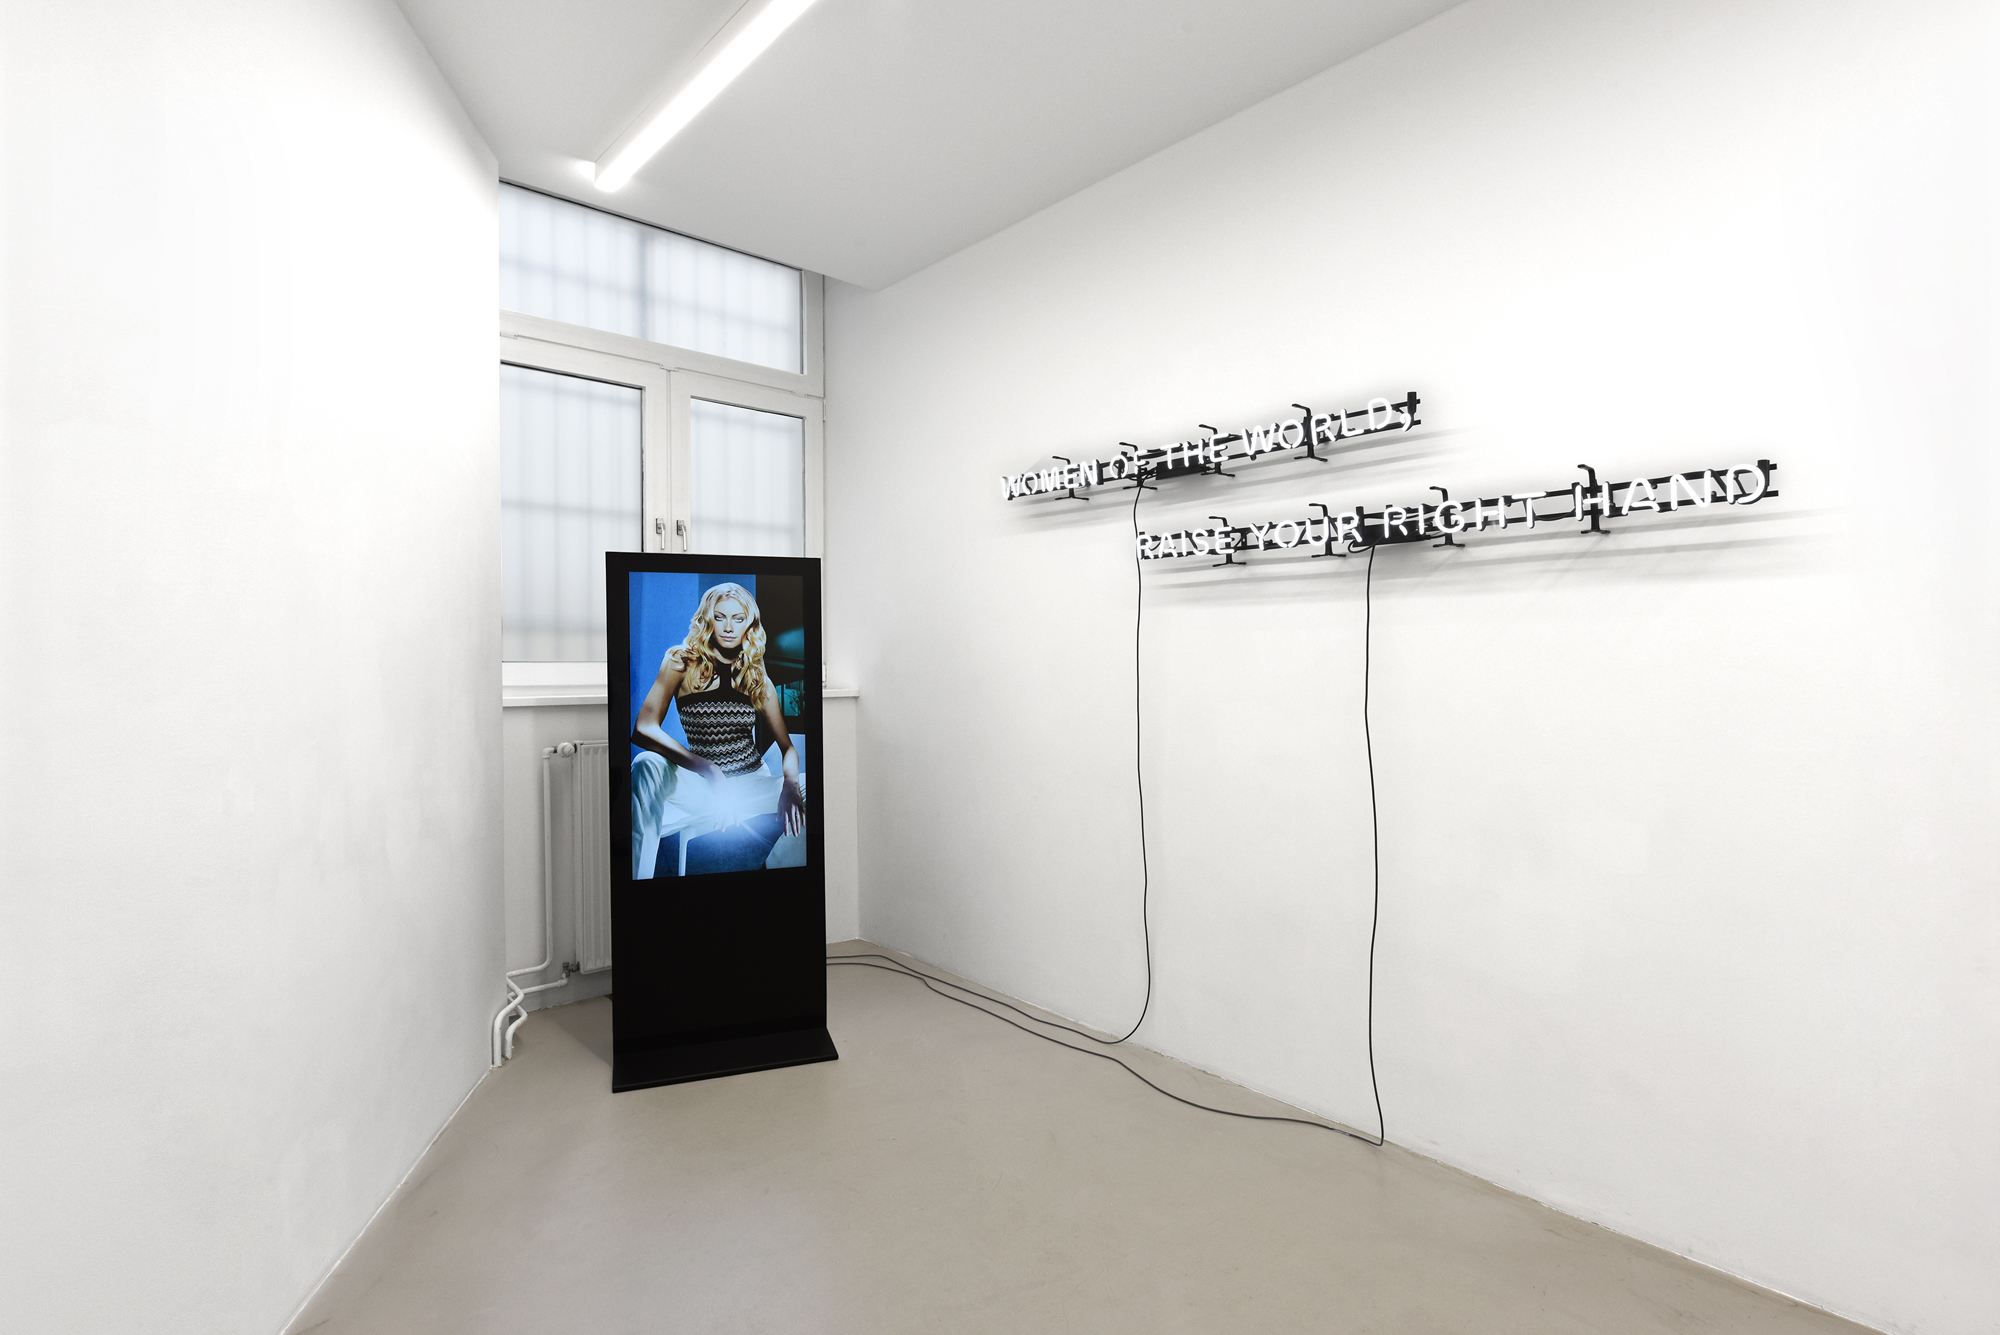 Marge Monko näitus Berliinis. Foto: JJ Images